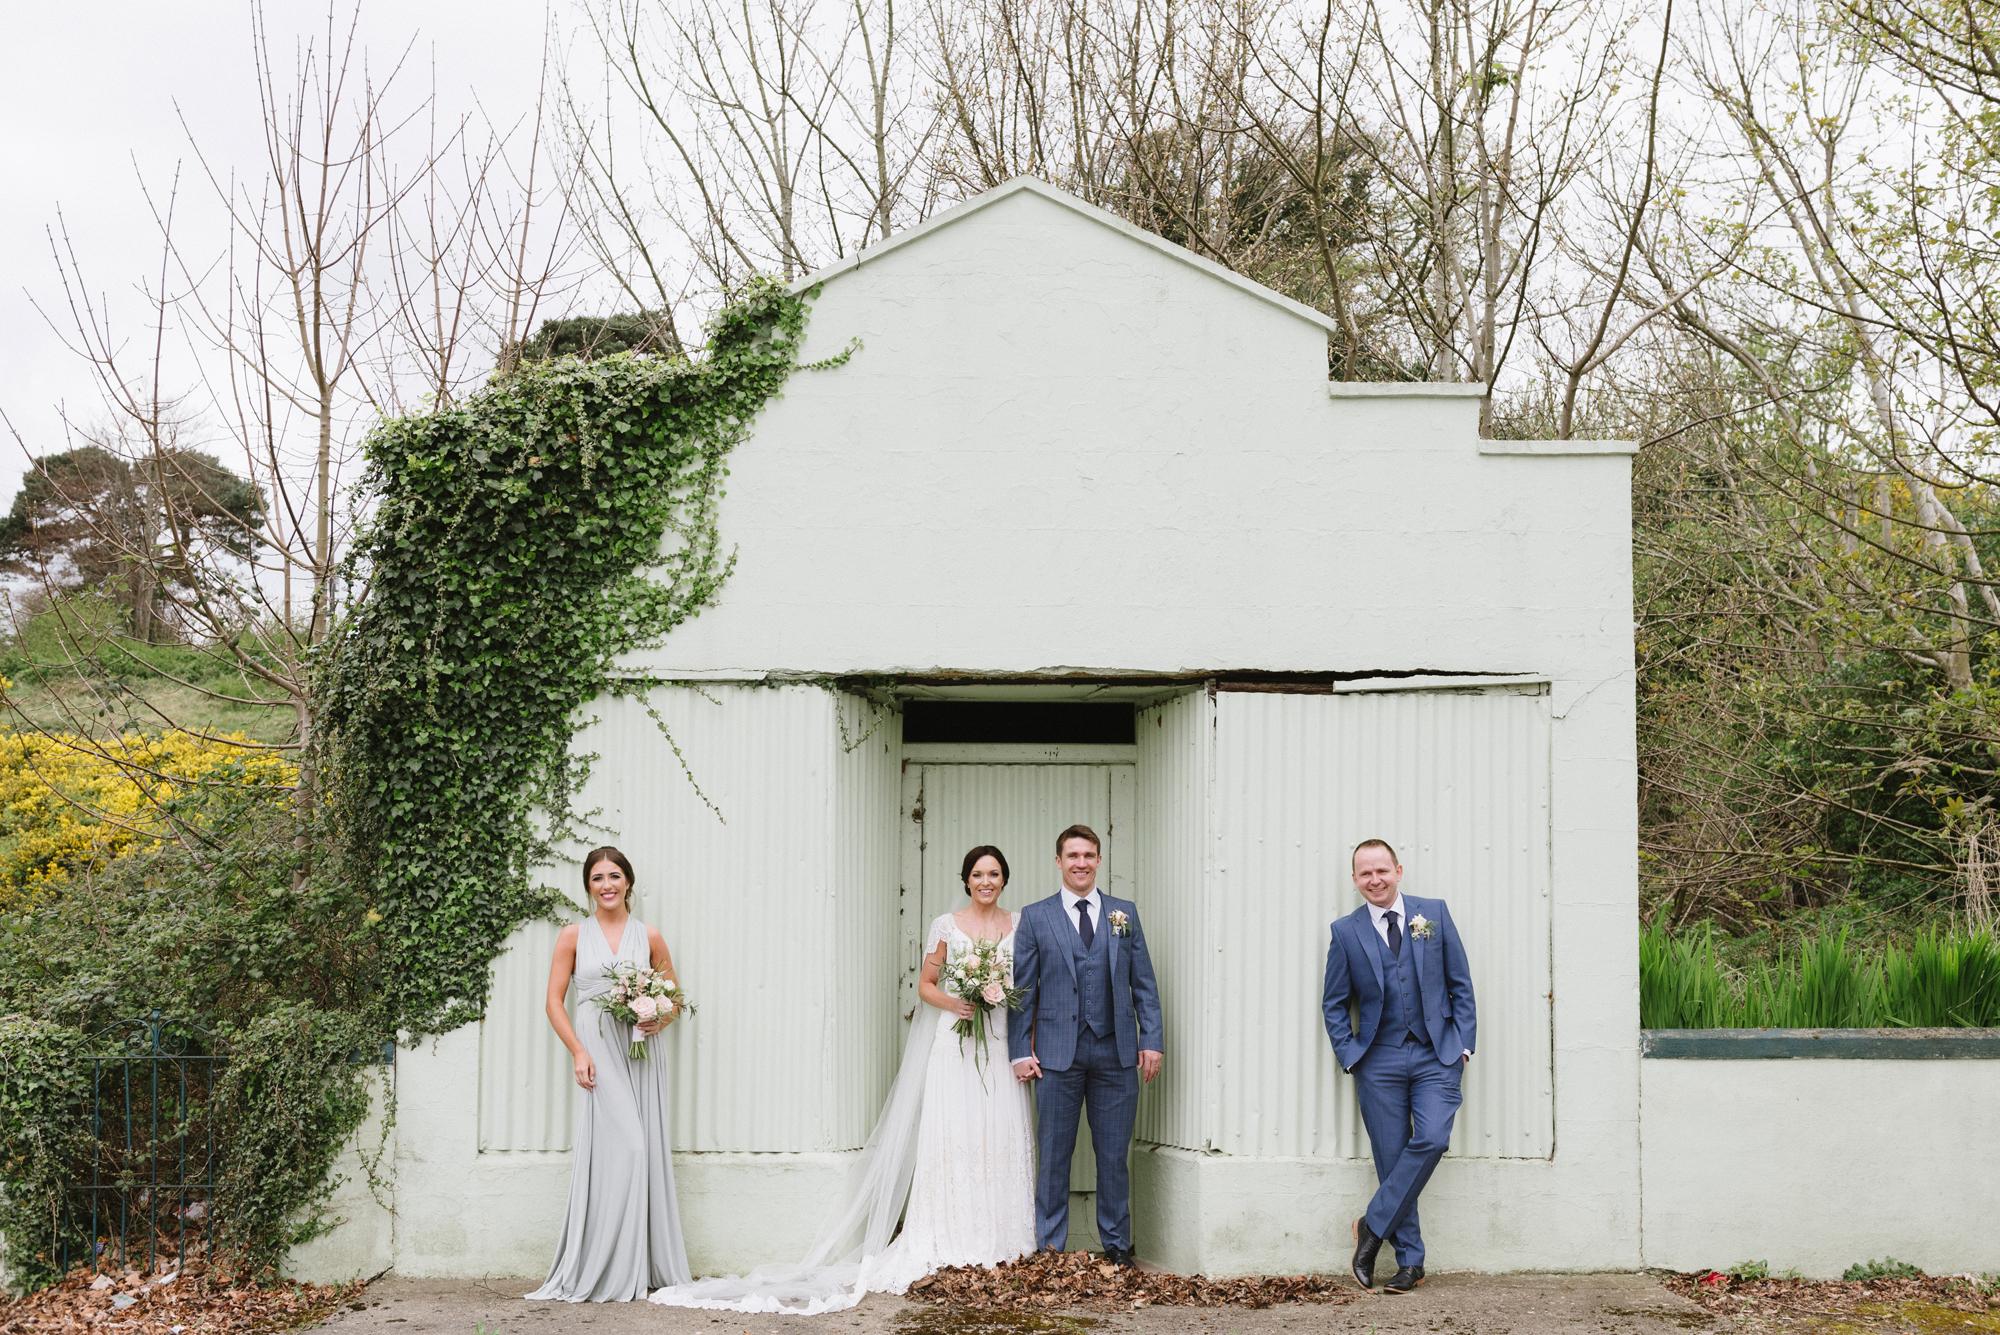 ghan_house_Wedding_Sarah_Fyffe_wedding_photographyer_8.jpg